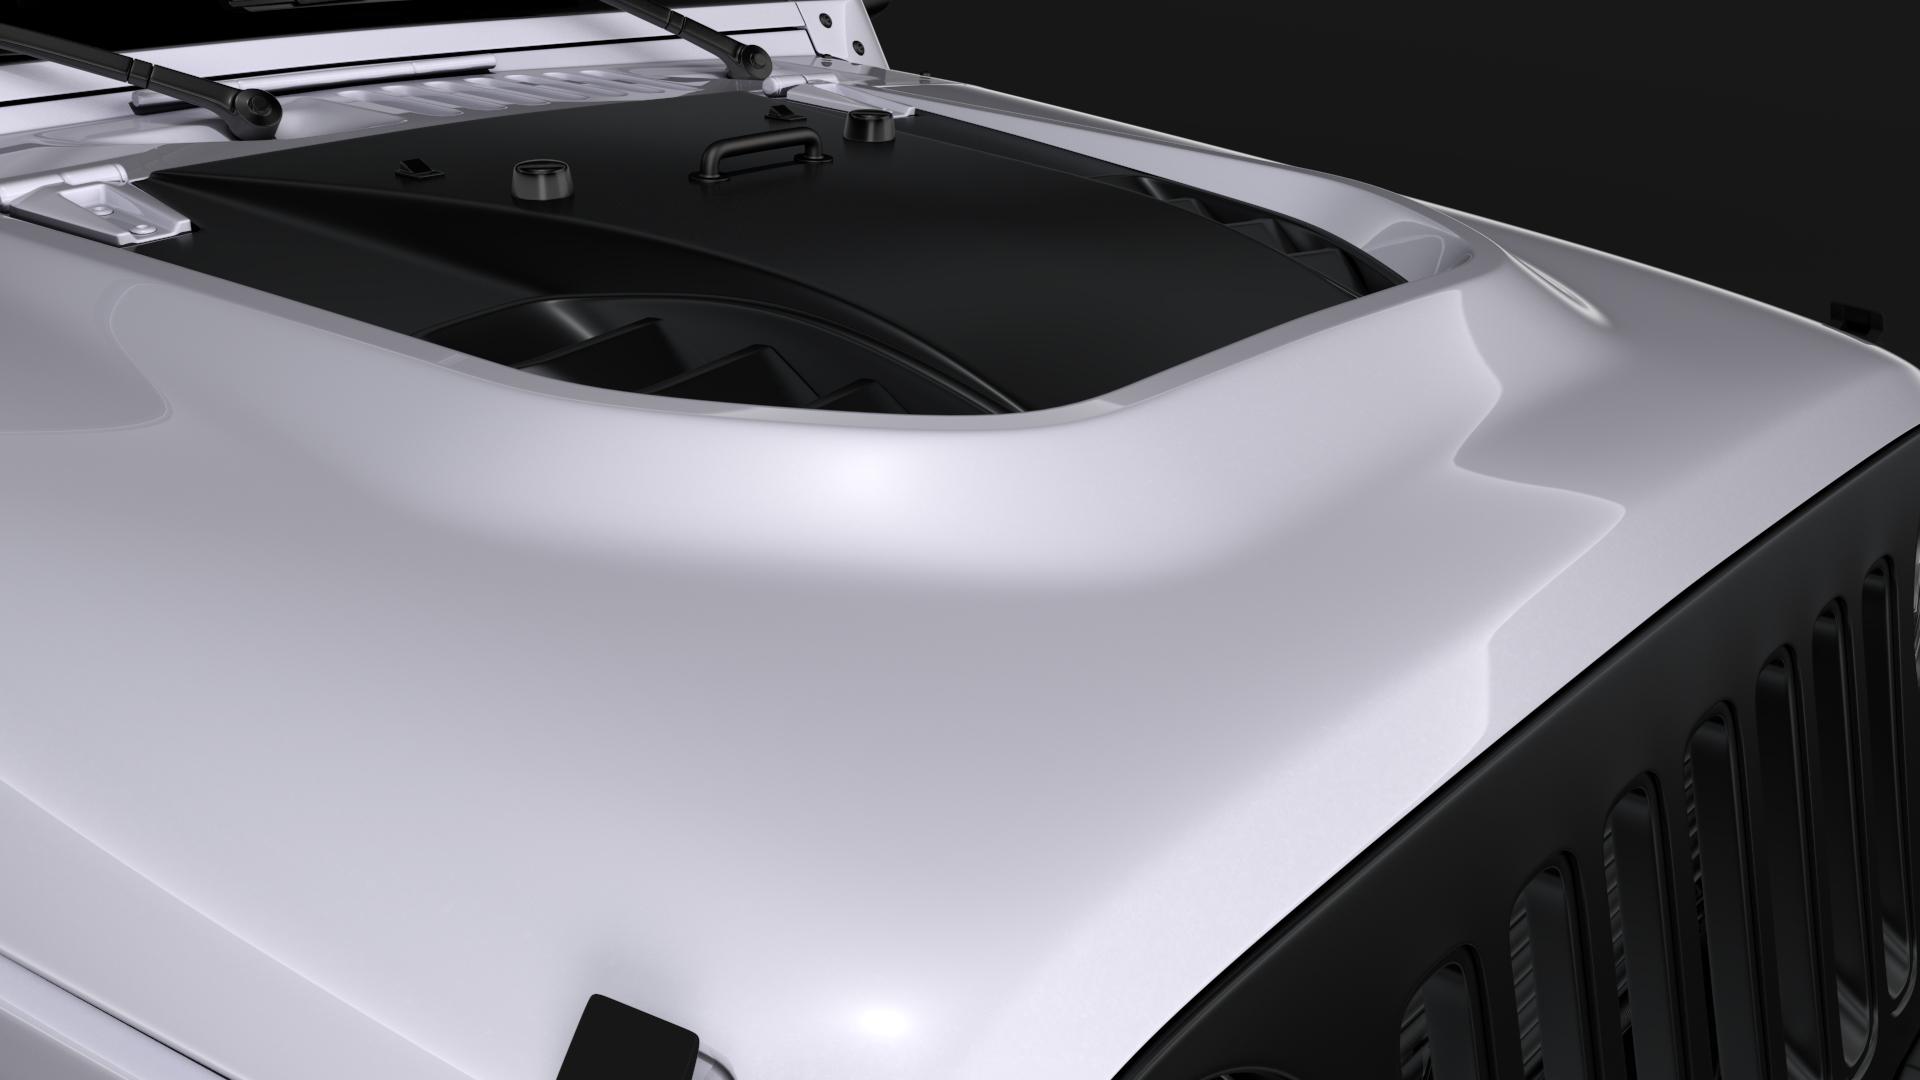 jeep wrangler crawler rubicon recon jk 2017 3d model max fbx c4d lwo ma mb hrc xsi obj 276912